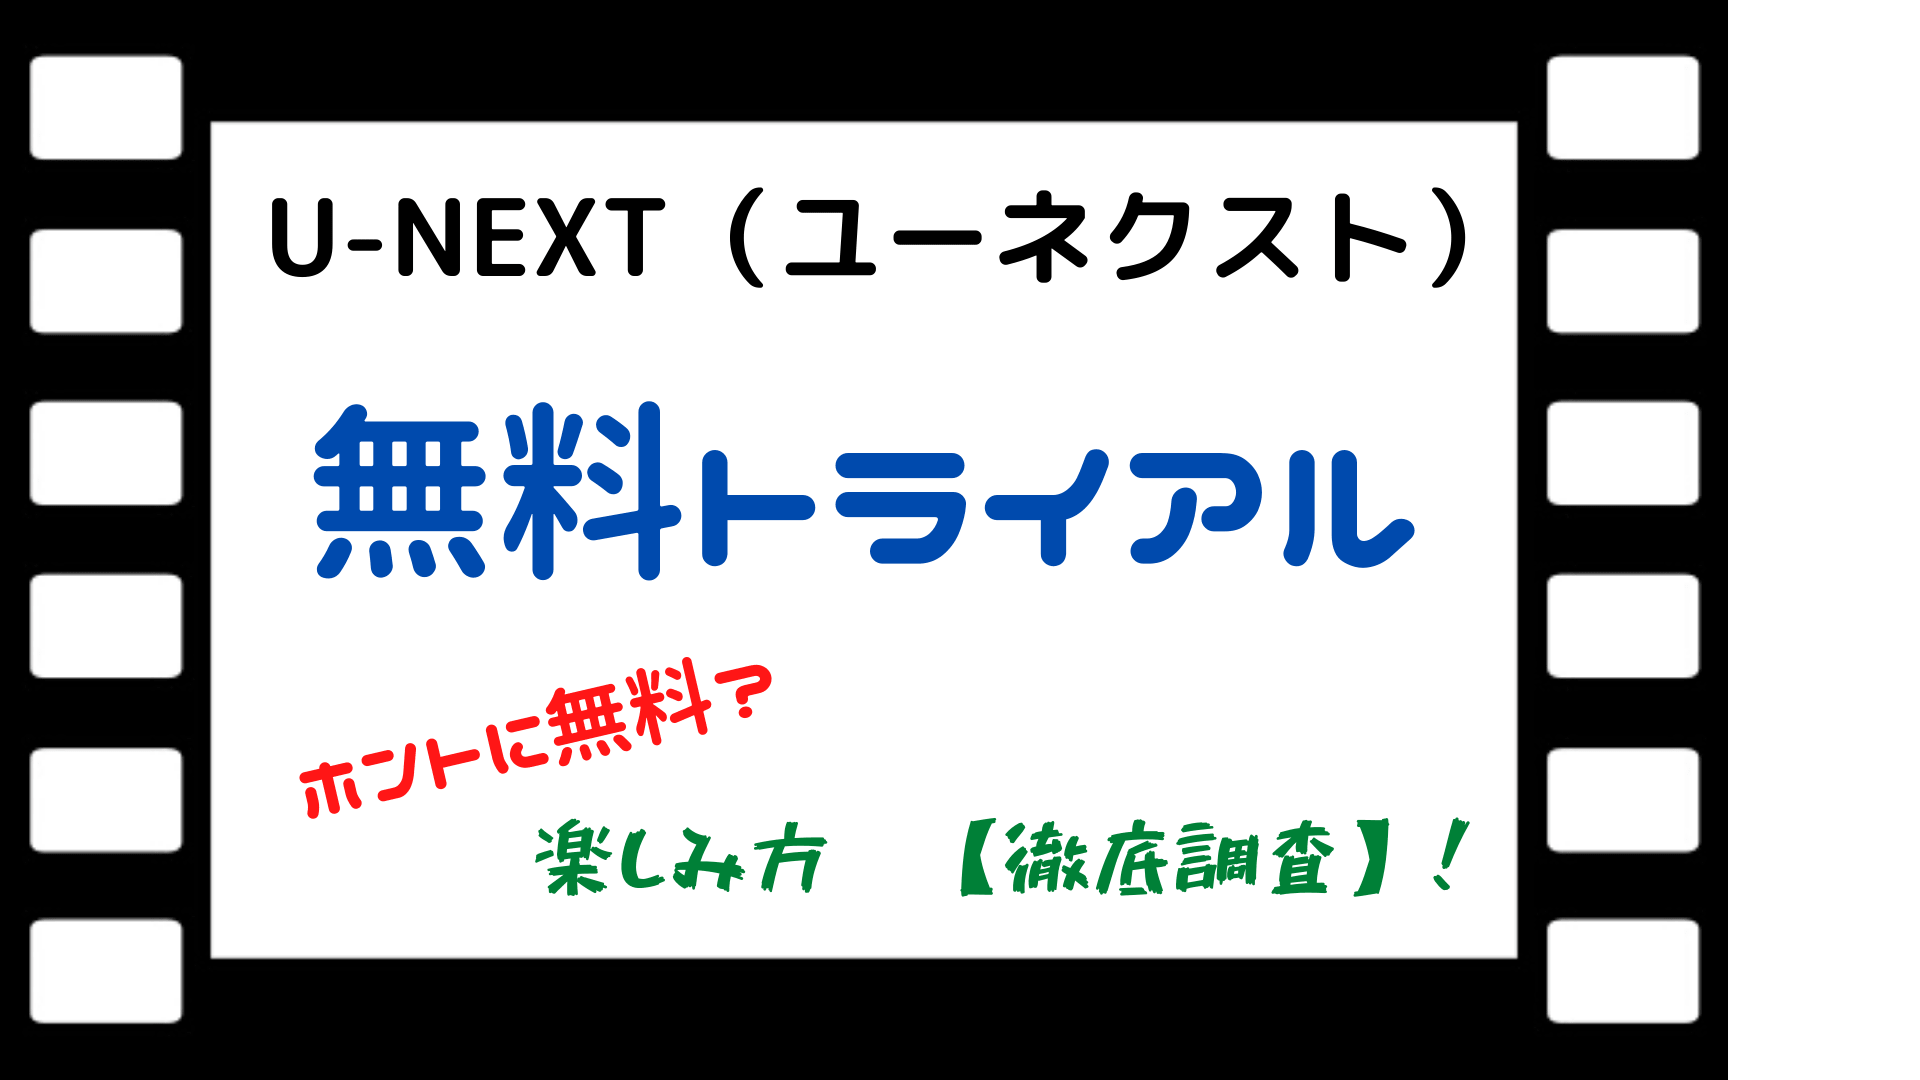 U-NEXT無料トライアルアイキャッチ